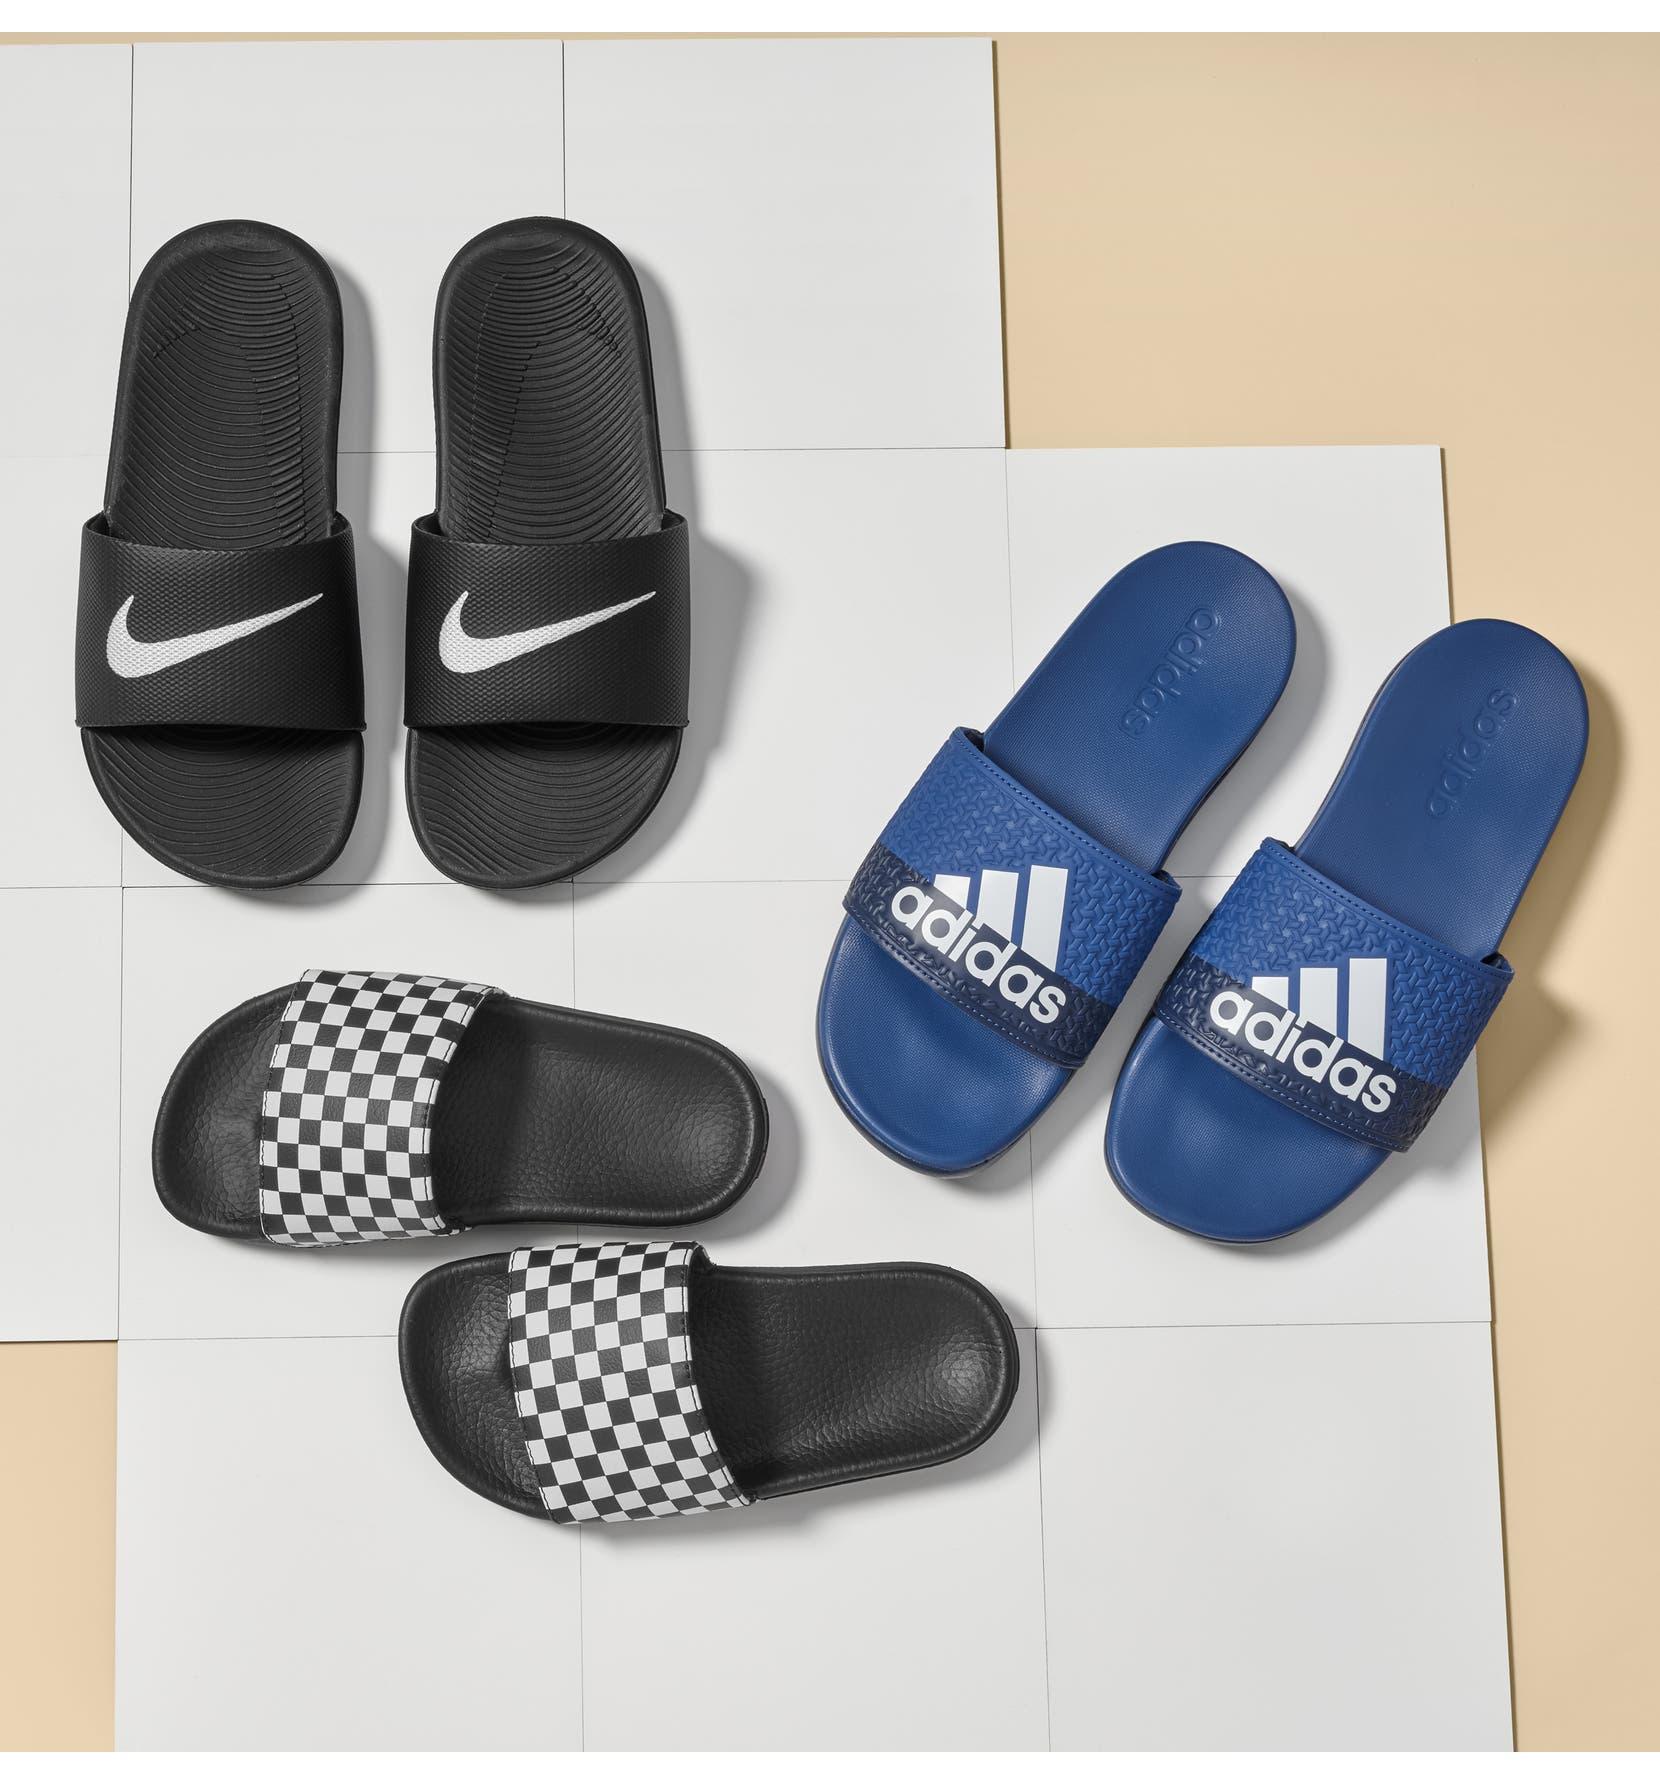 Issunday shop Adidas Originals Mini Shoulder bag | Facebook